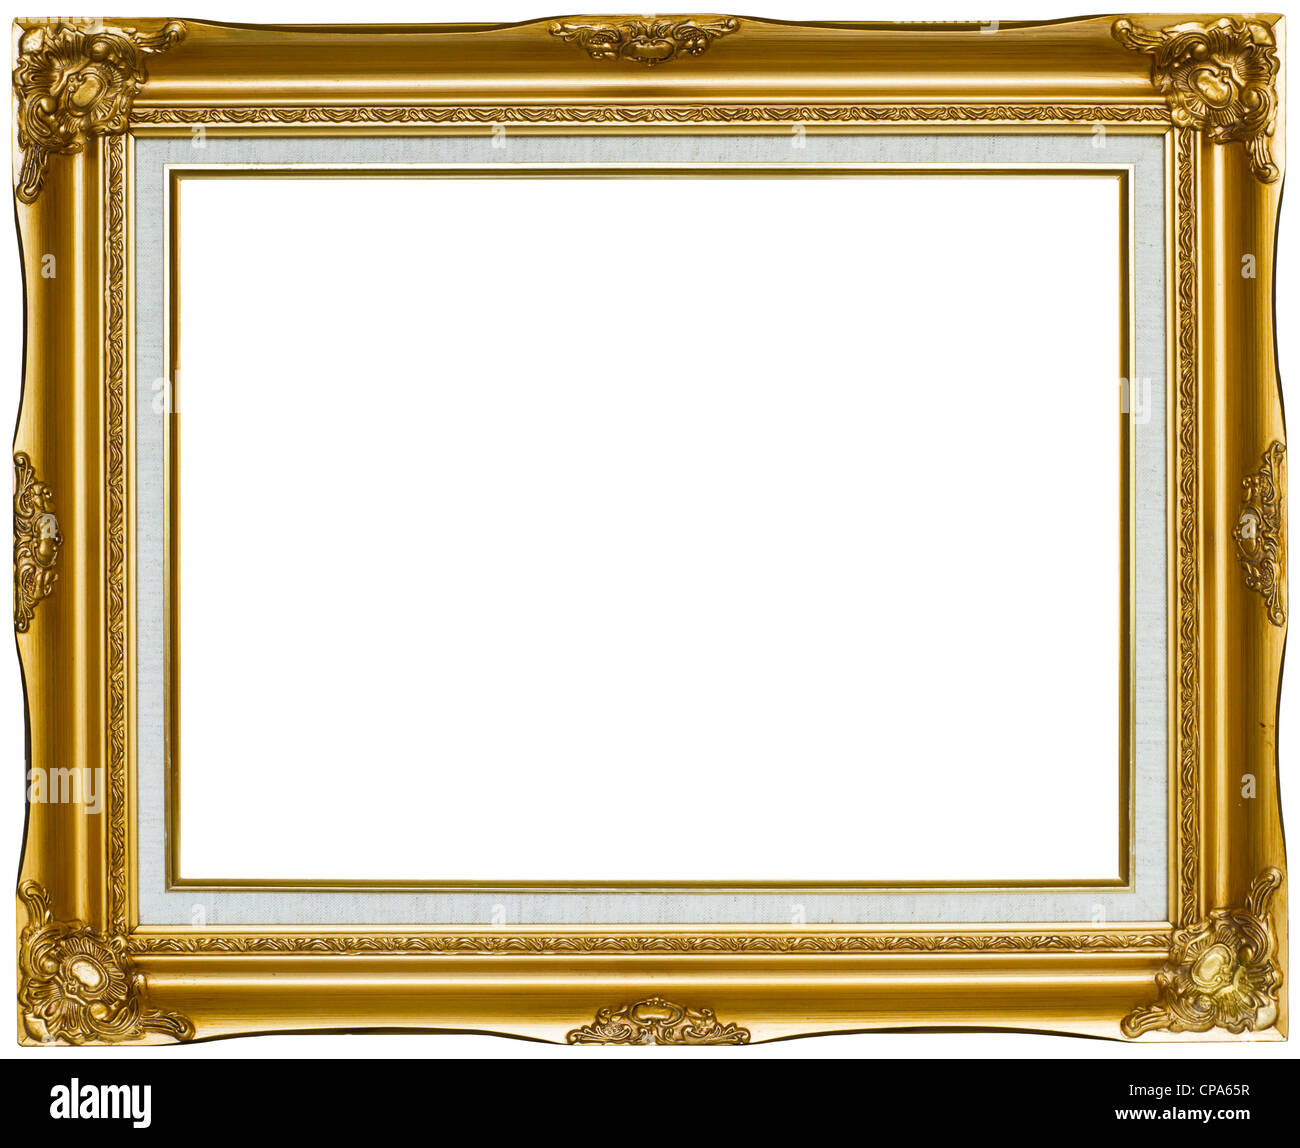 vintage gold bilderrahmen stockfoto bild 48167555 alamy. Black Bedroom Furniture Sets. Home Design Ideas